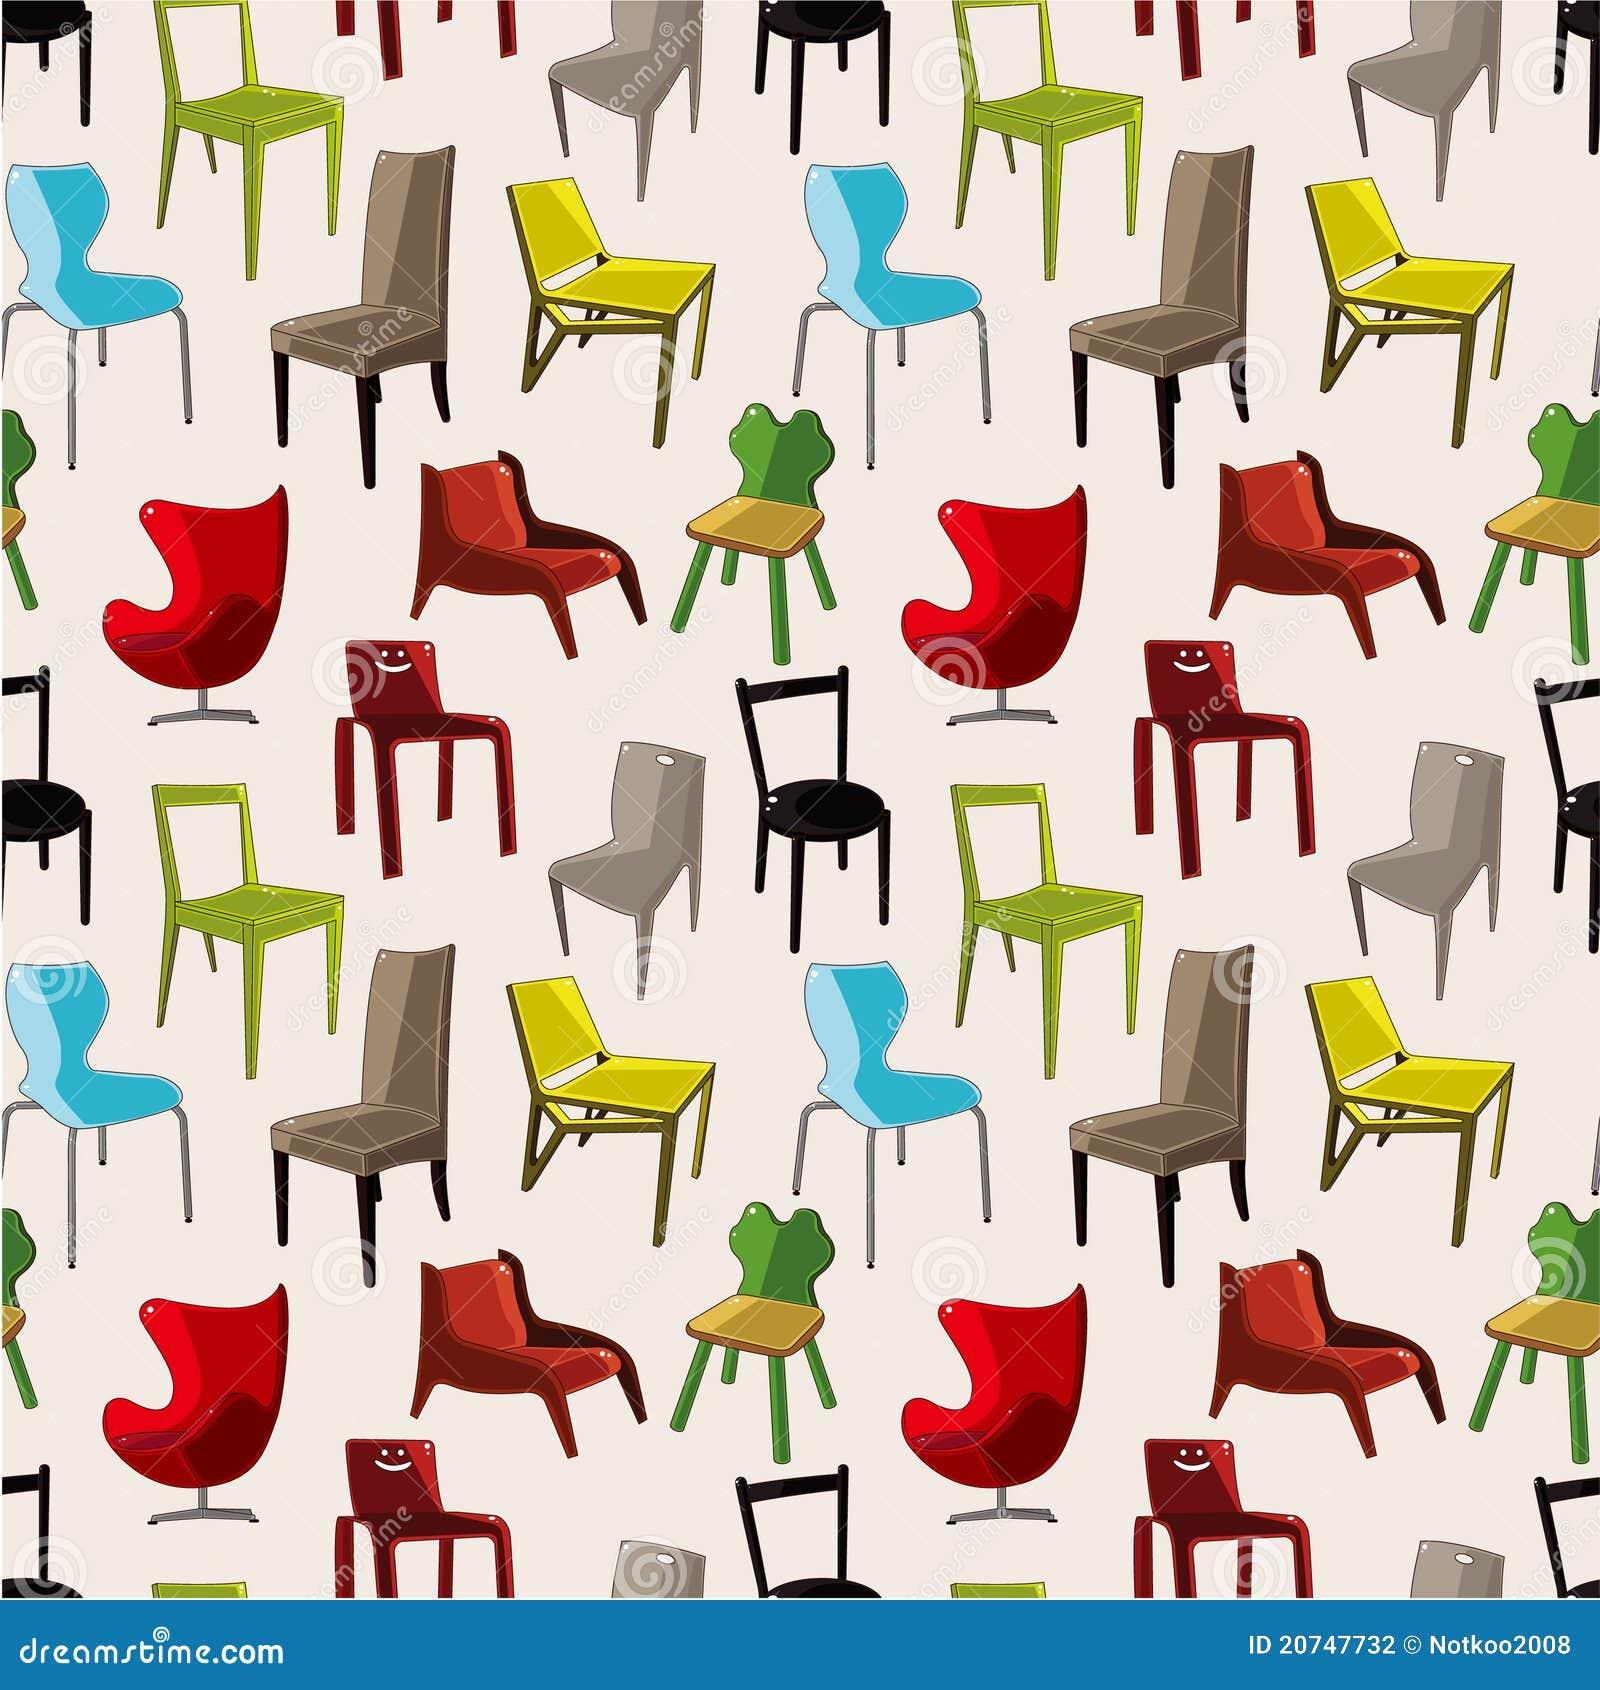 Chair furniture seamless pattern